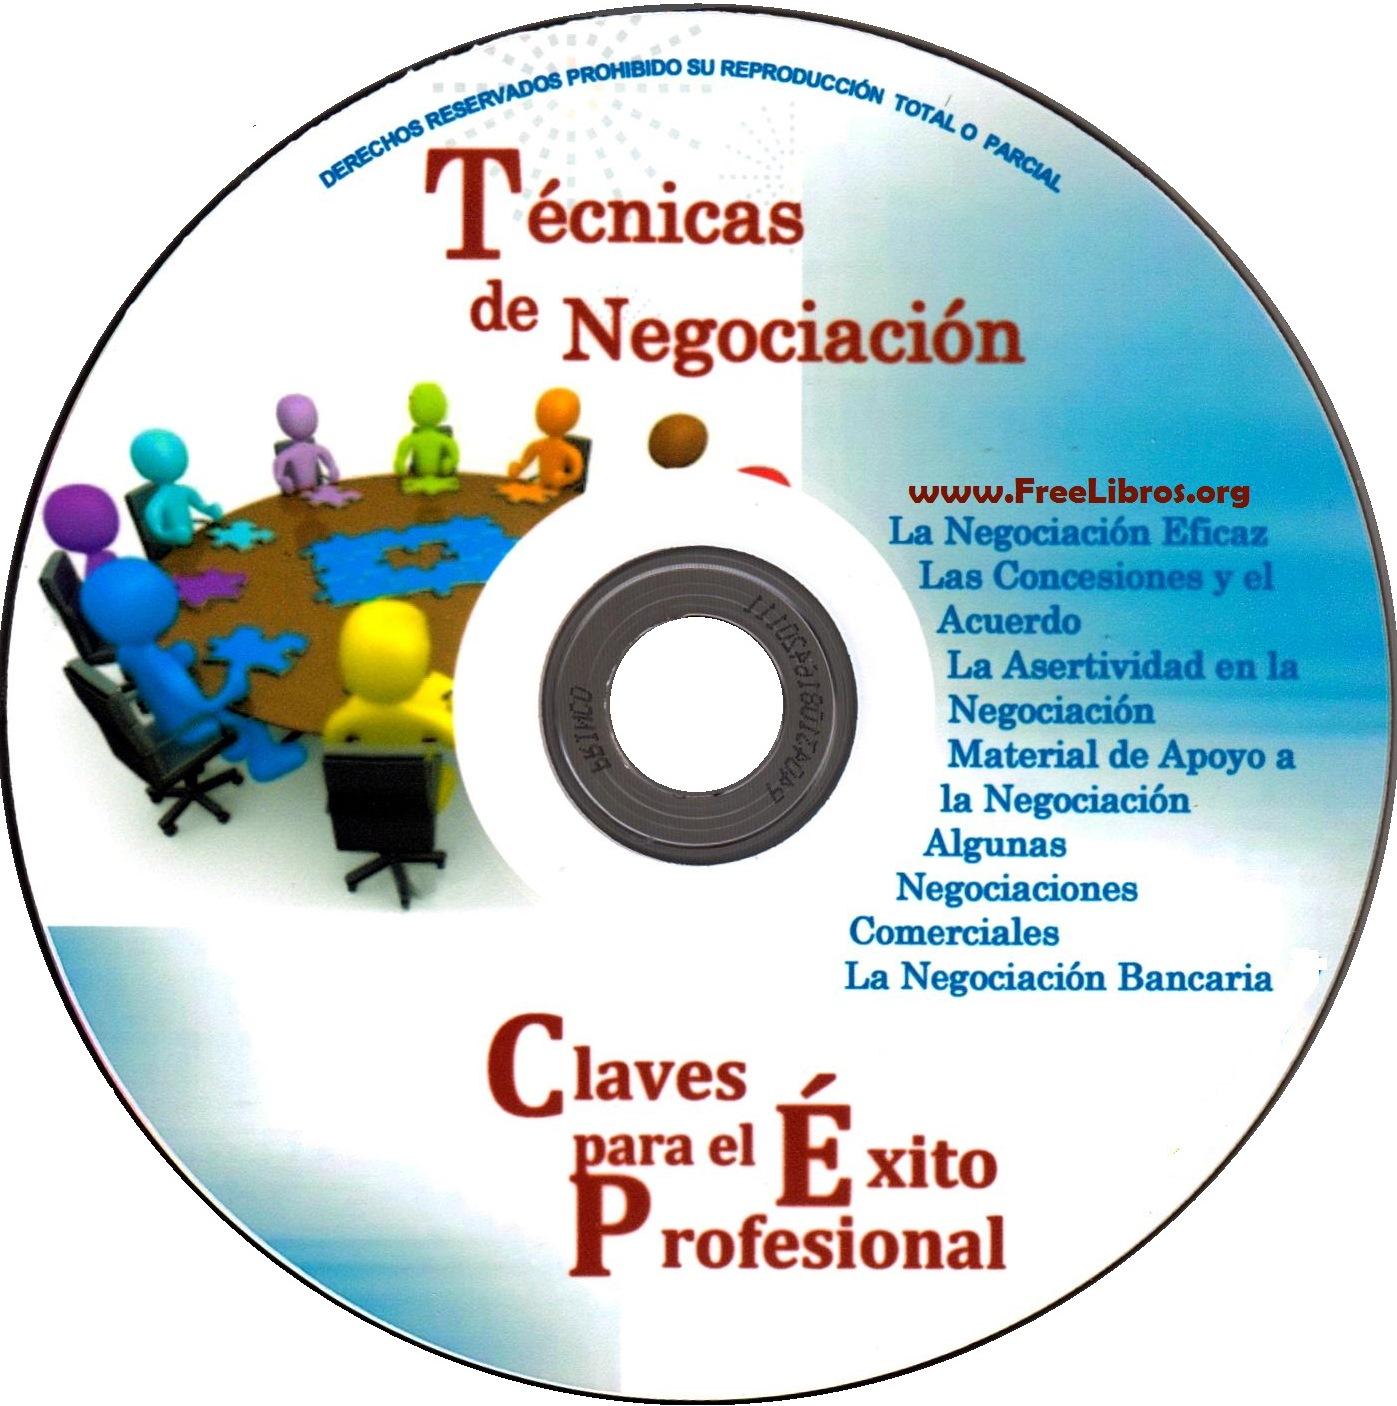 Técnicas de negociación: Claves para el éxito profesional